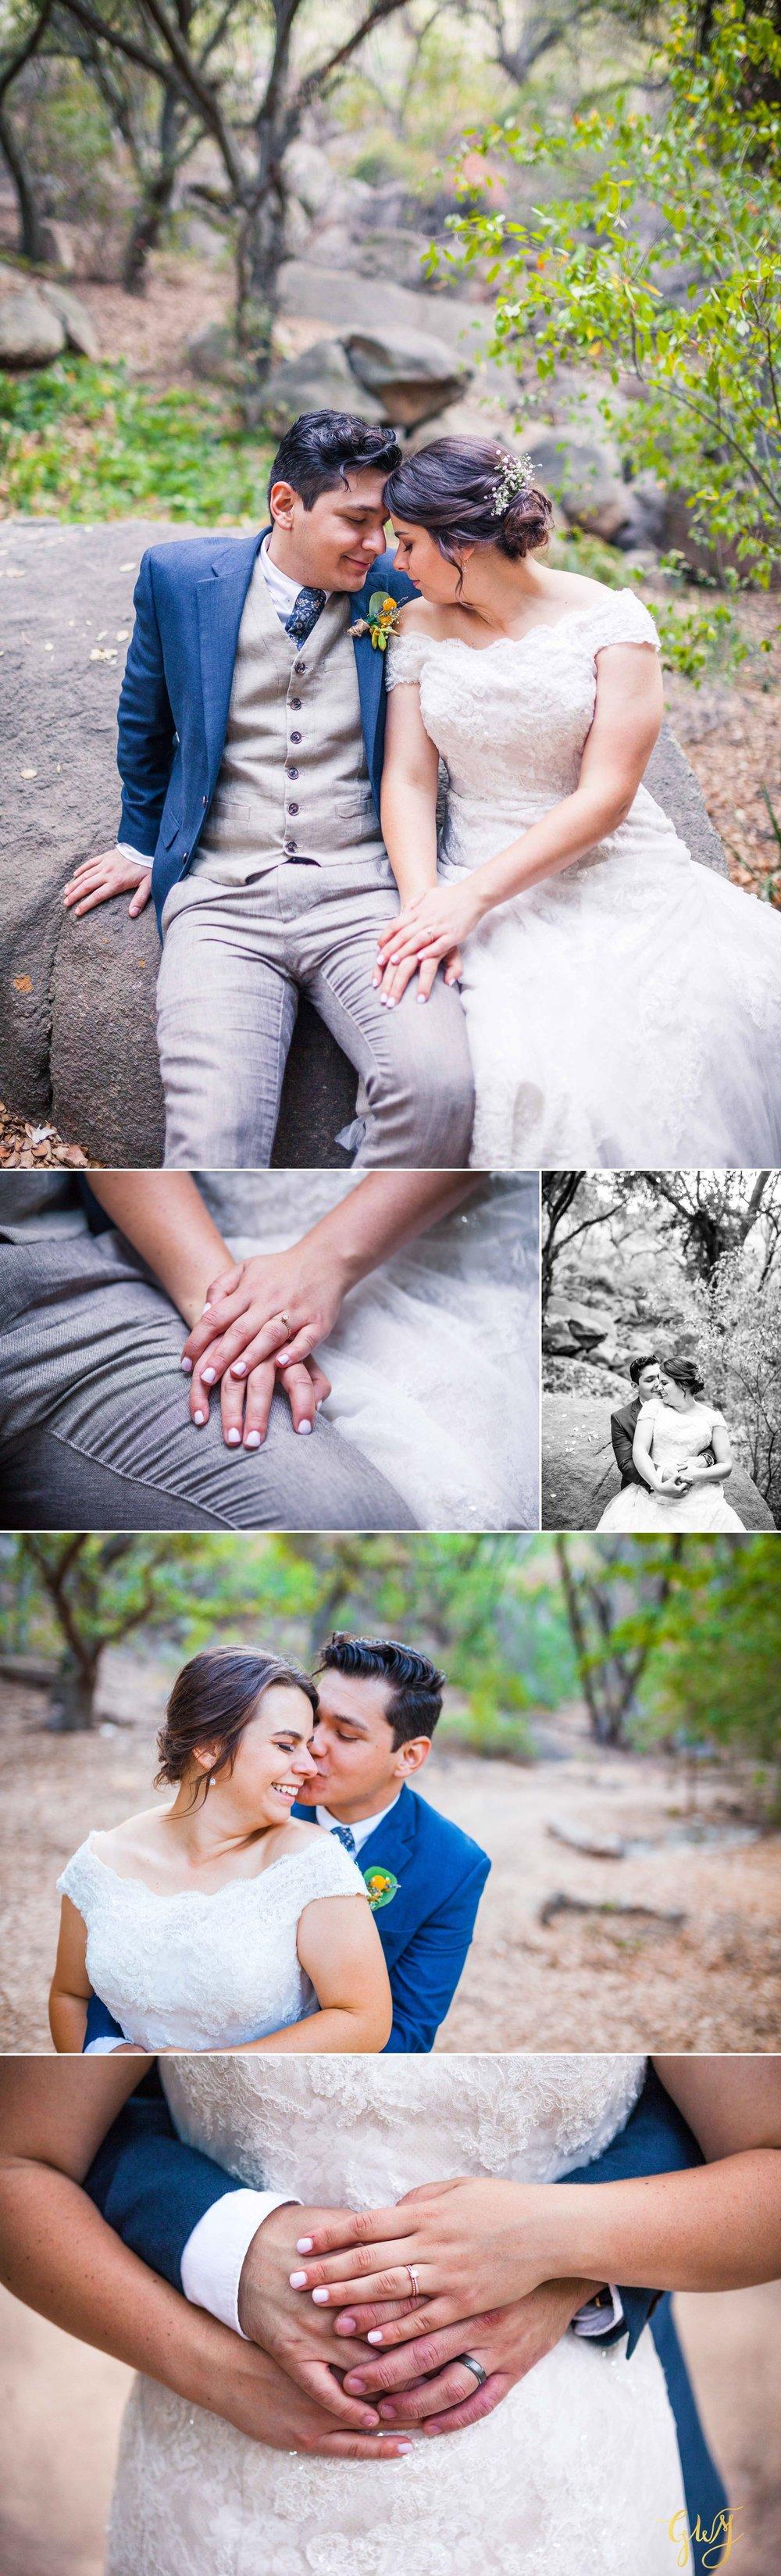 Hannah + Lorenzo Secluded Garden Estate Temecula DIY Wedding by Glass Woods Media 21.jpg